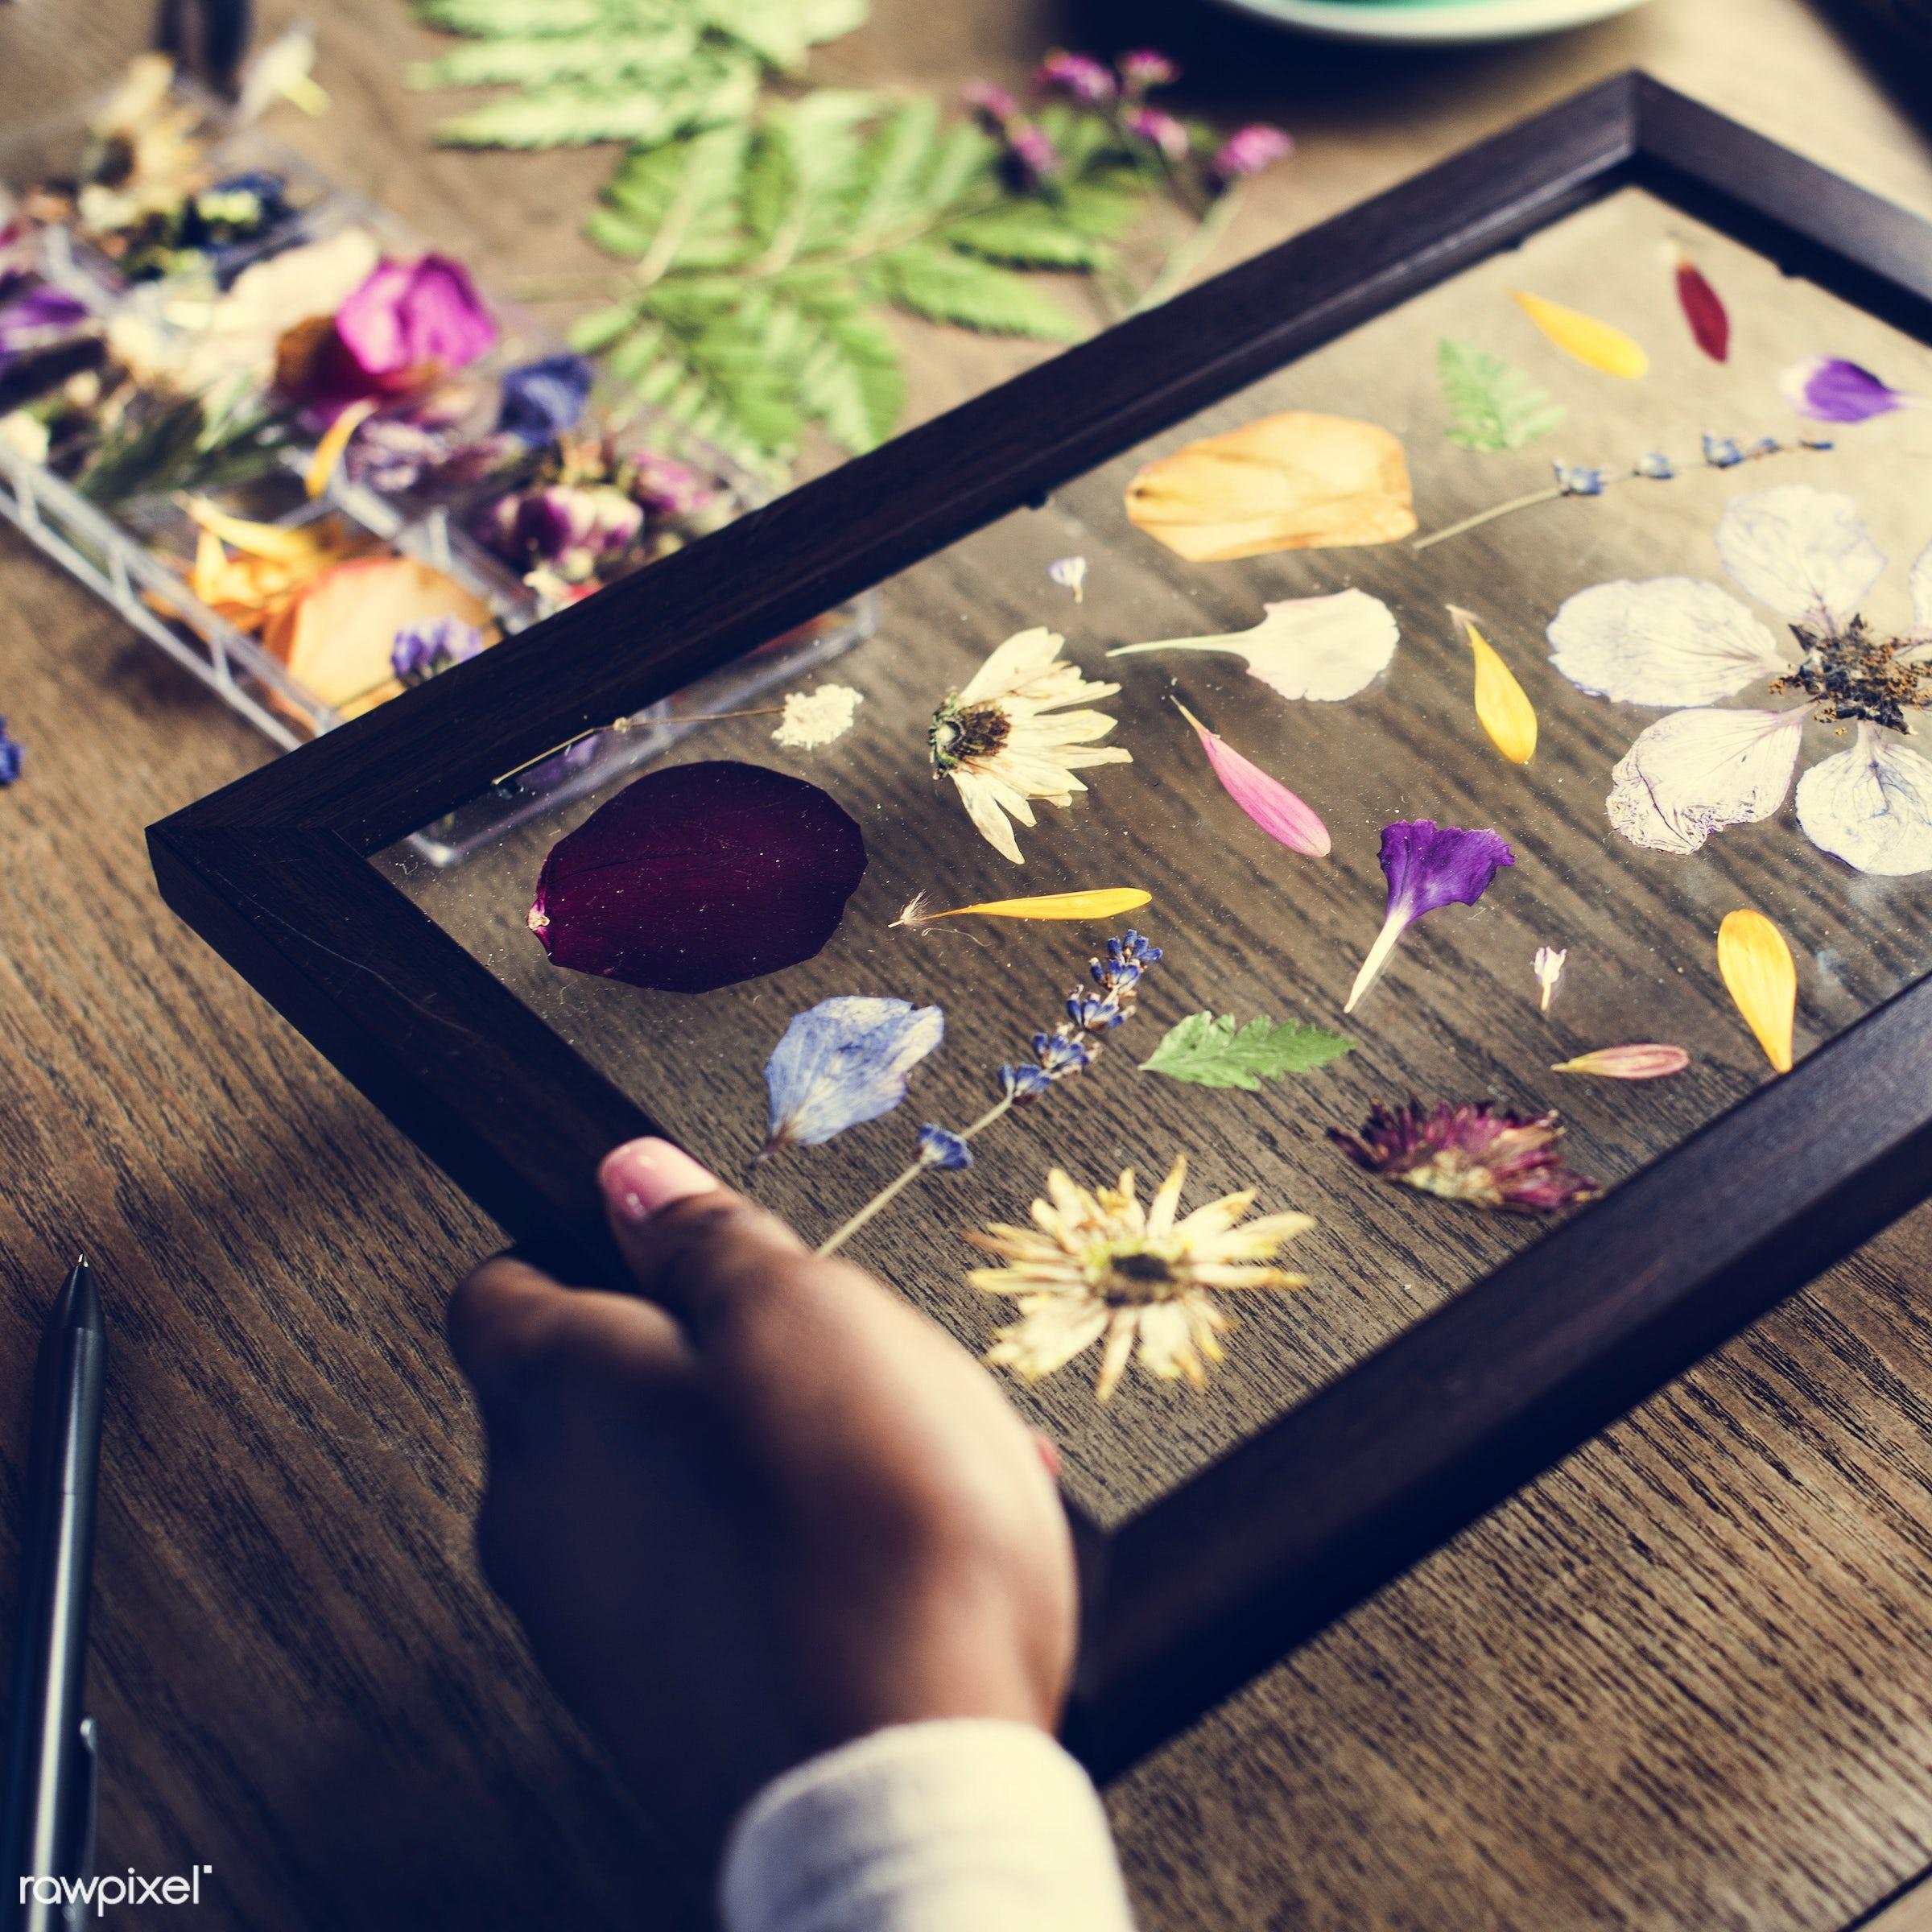 craft, aromatic, decorative, handicraft, beauty, rustic, handiwork, style, nature, hands, dry, vintage, flora, art,...